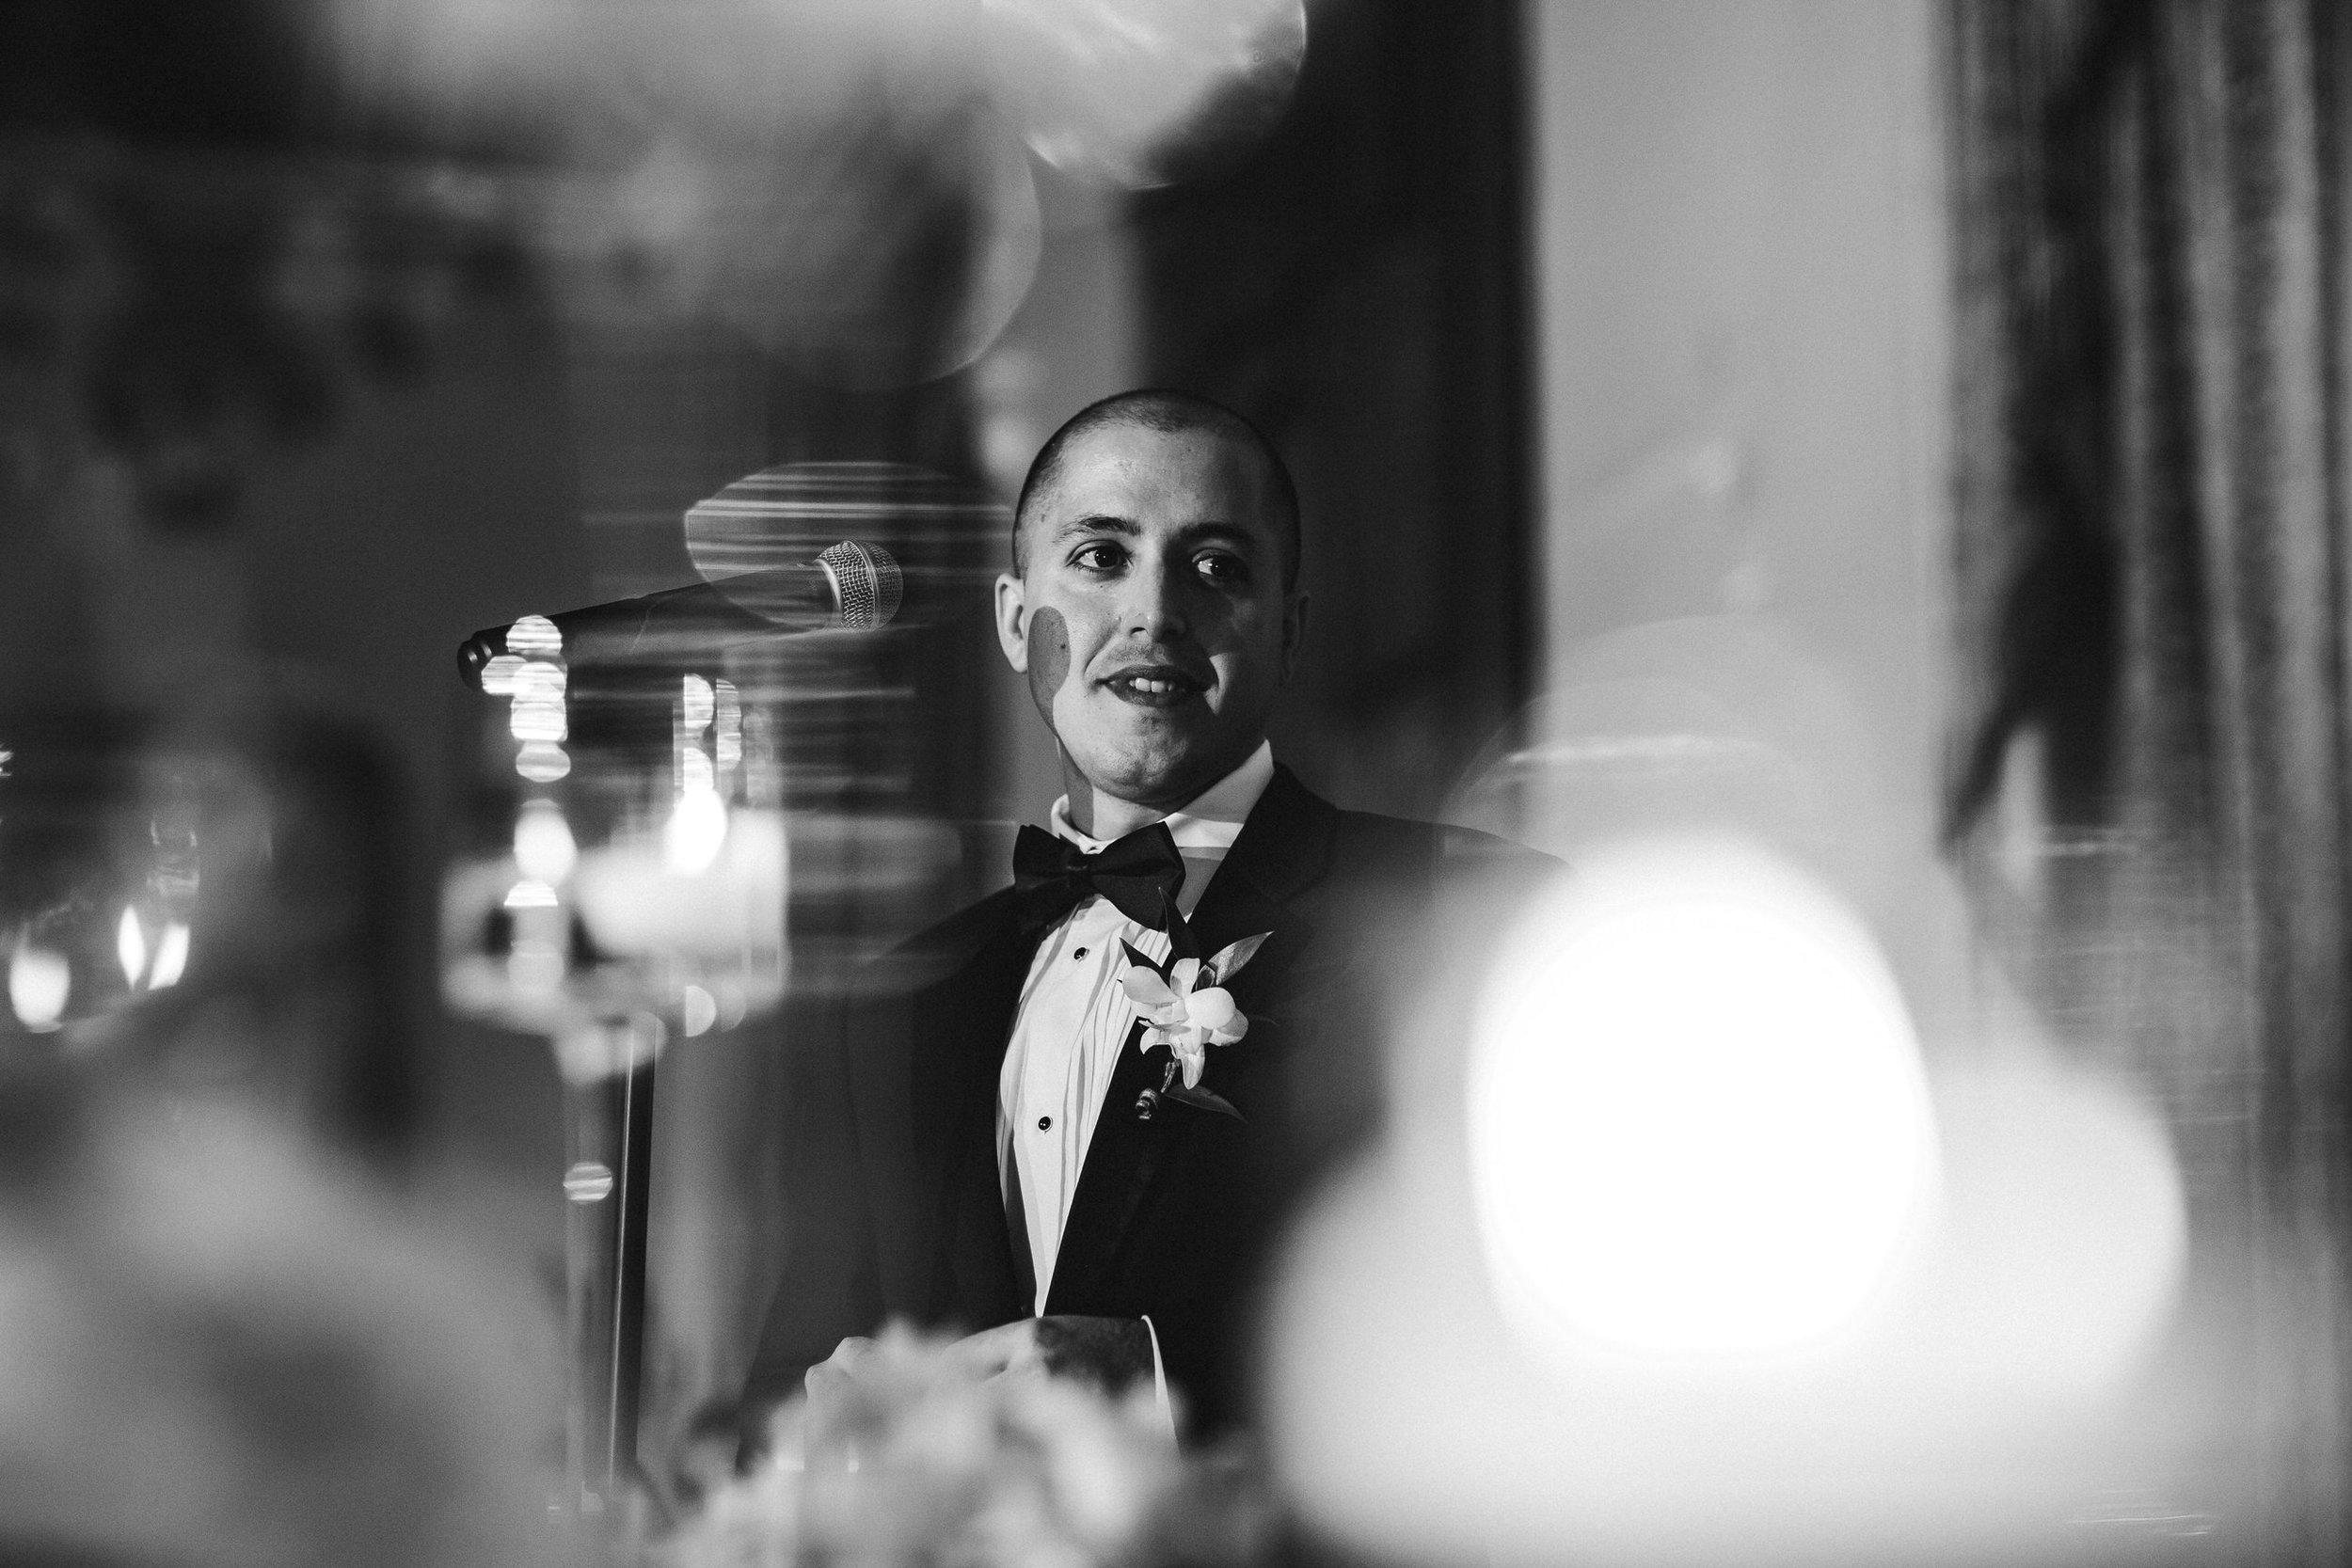 miami-biltmore-wedding-photographer-reception-party-19.jpg